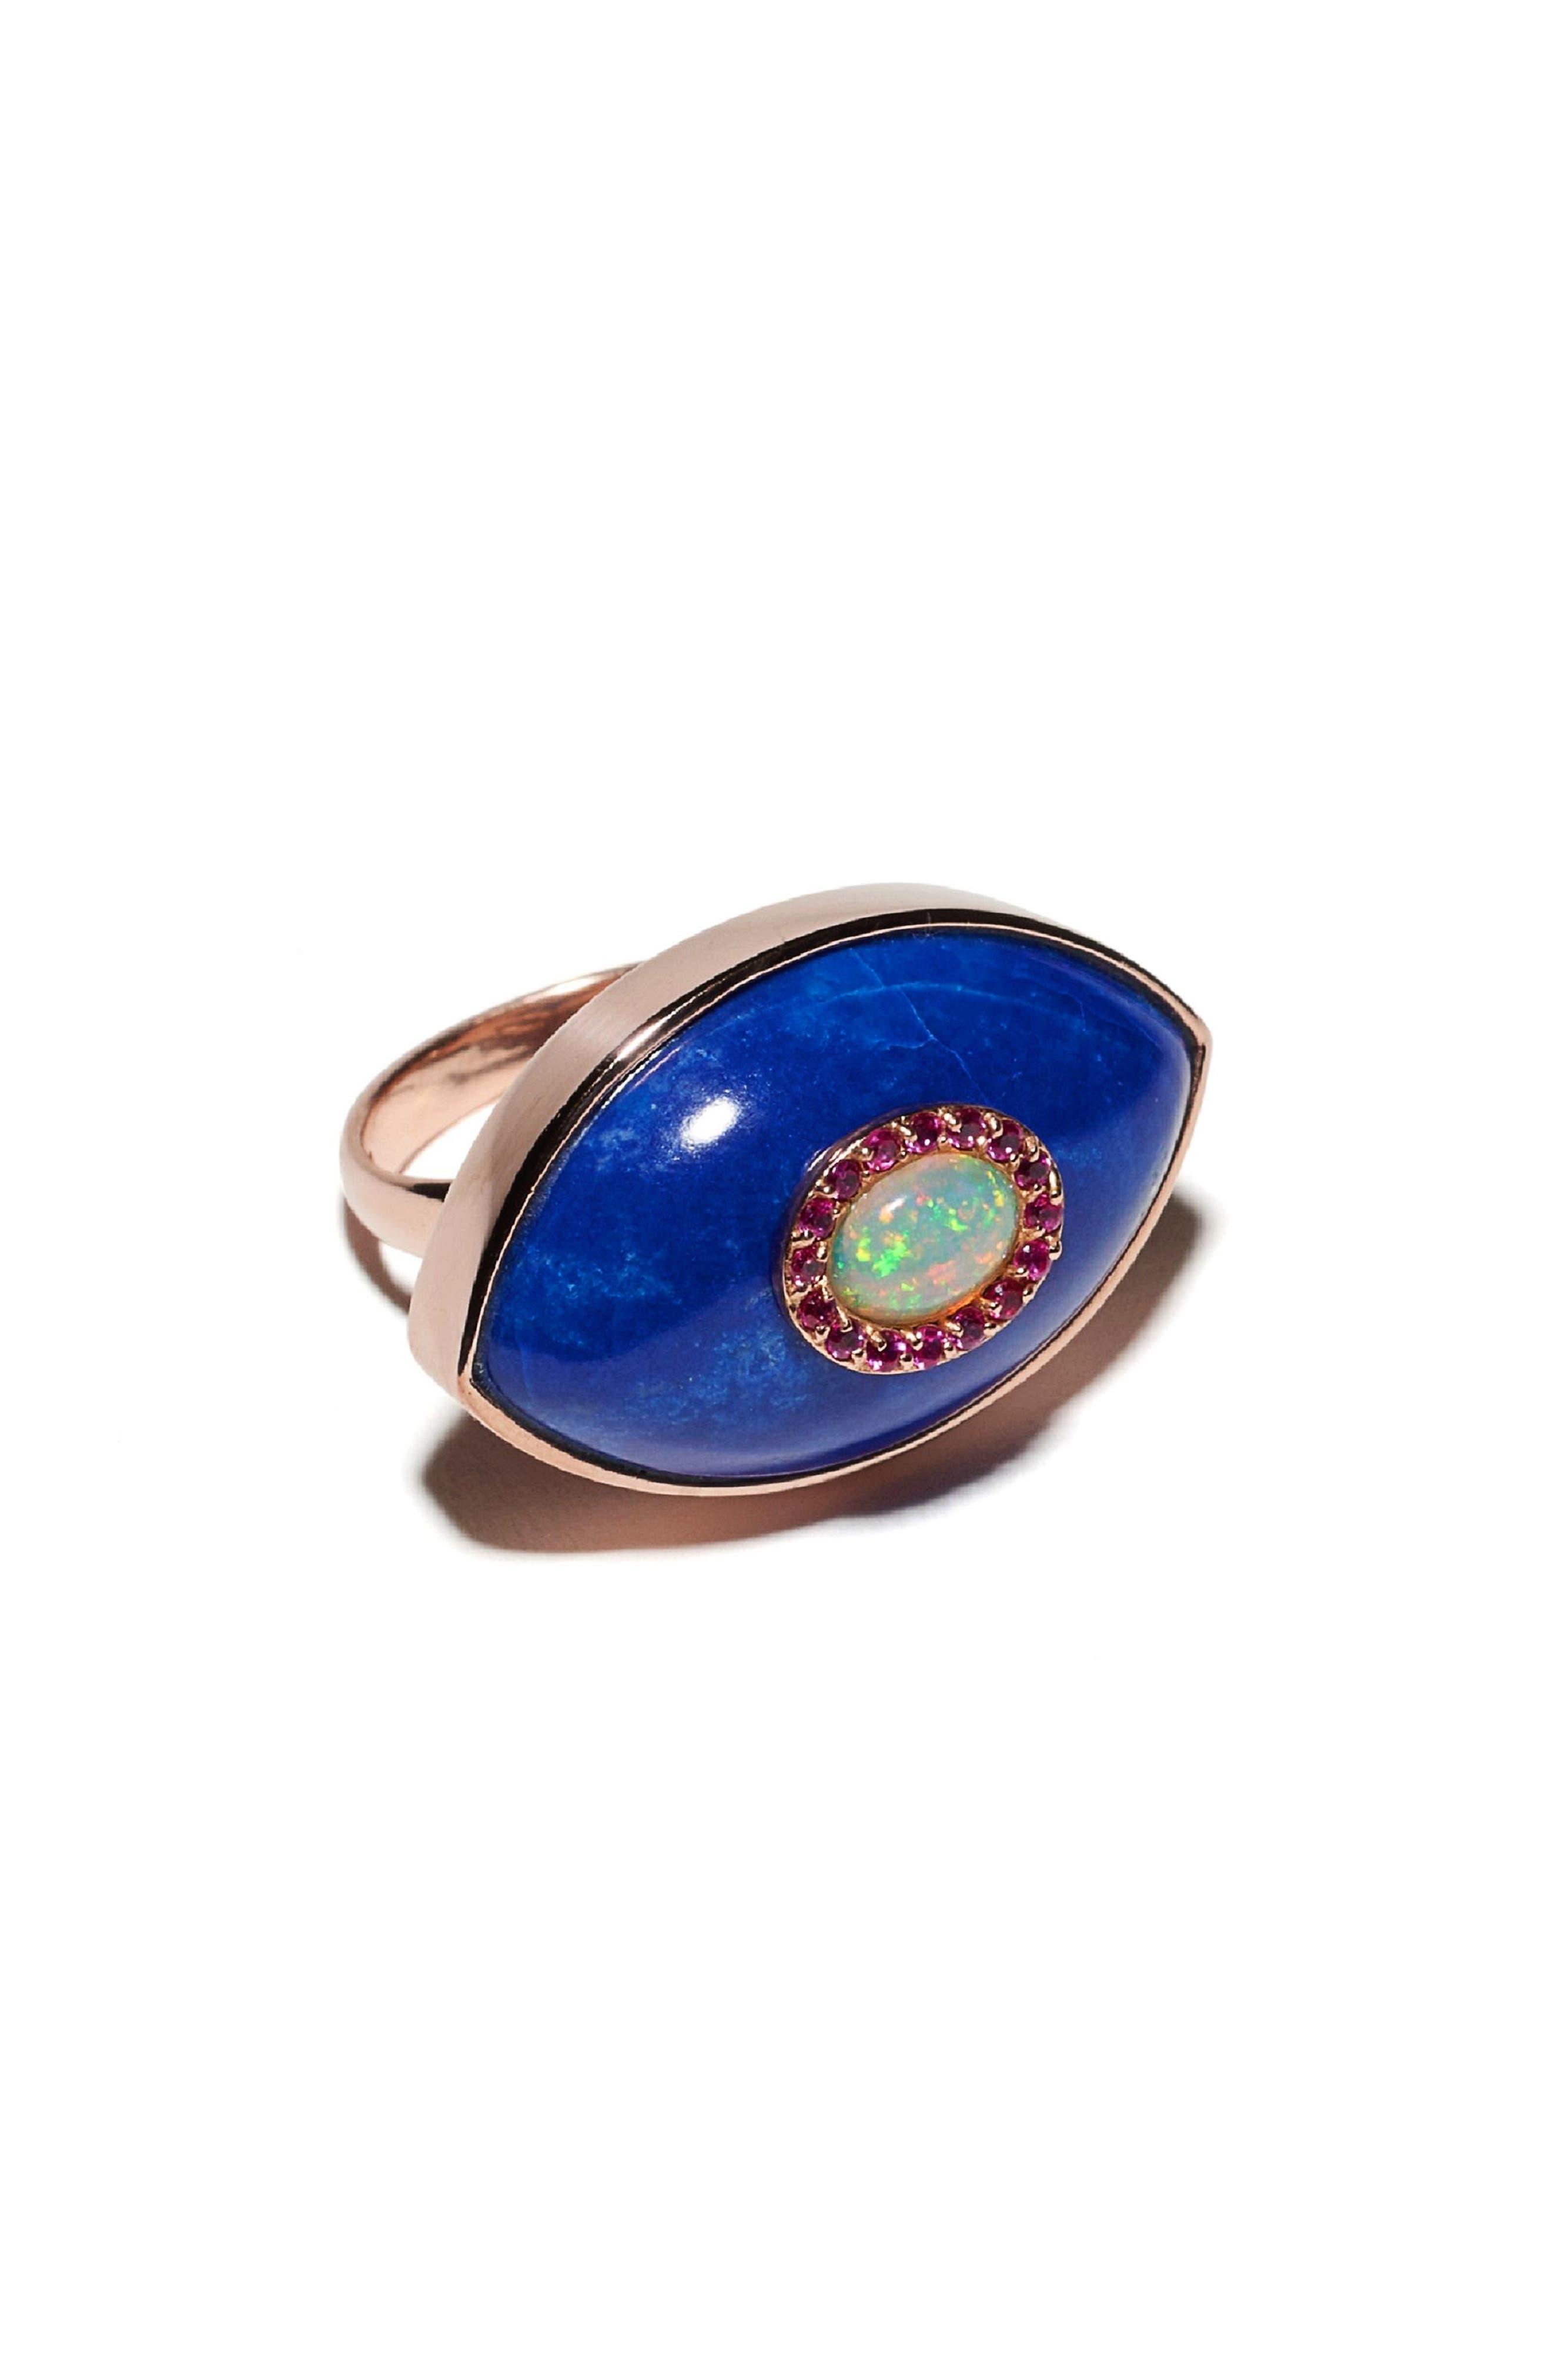 MARLO LAZ Iris Ring in Rose Gold